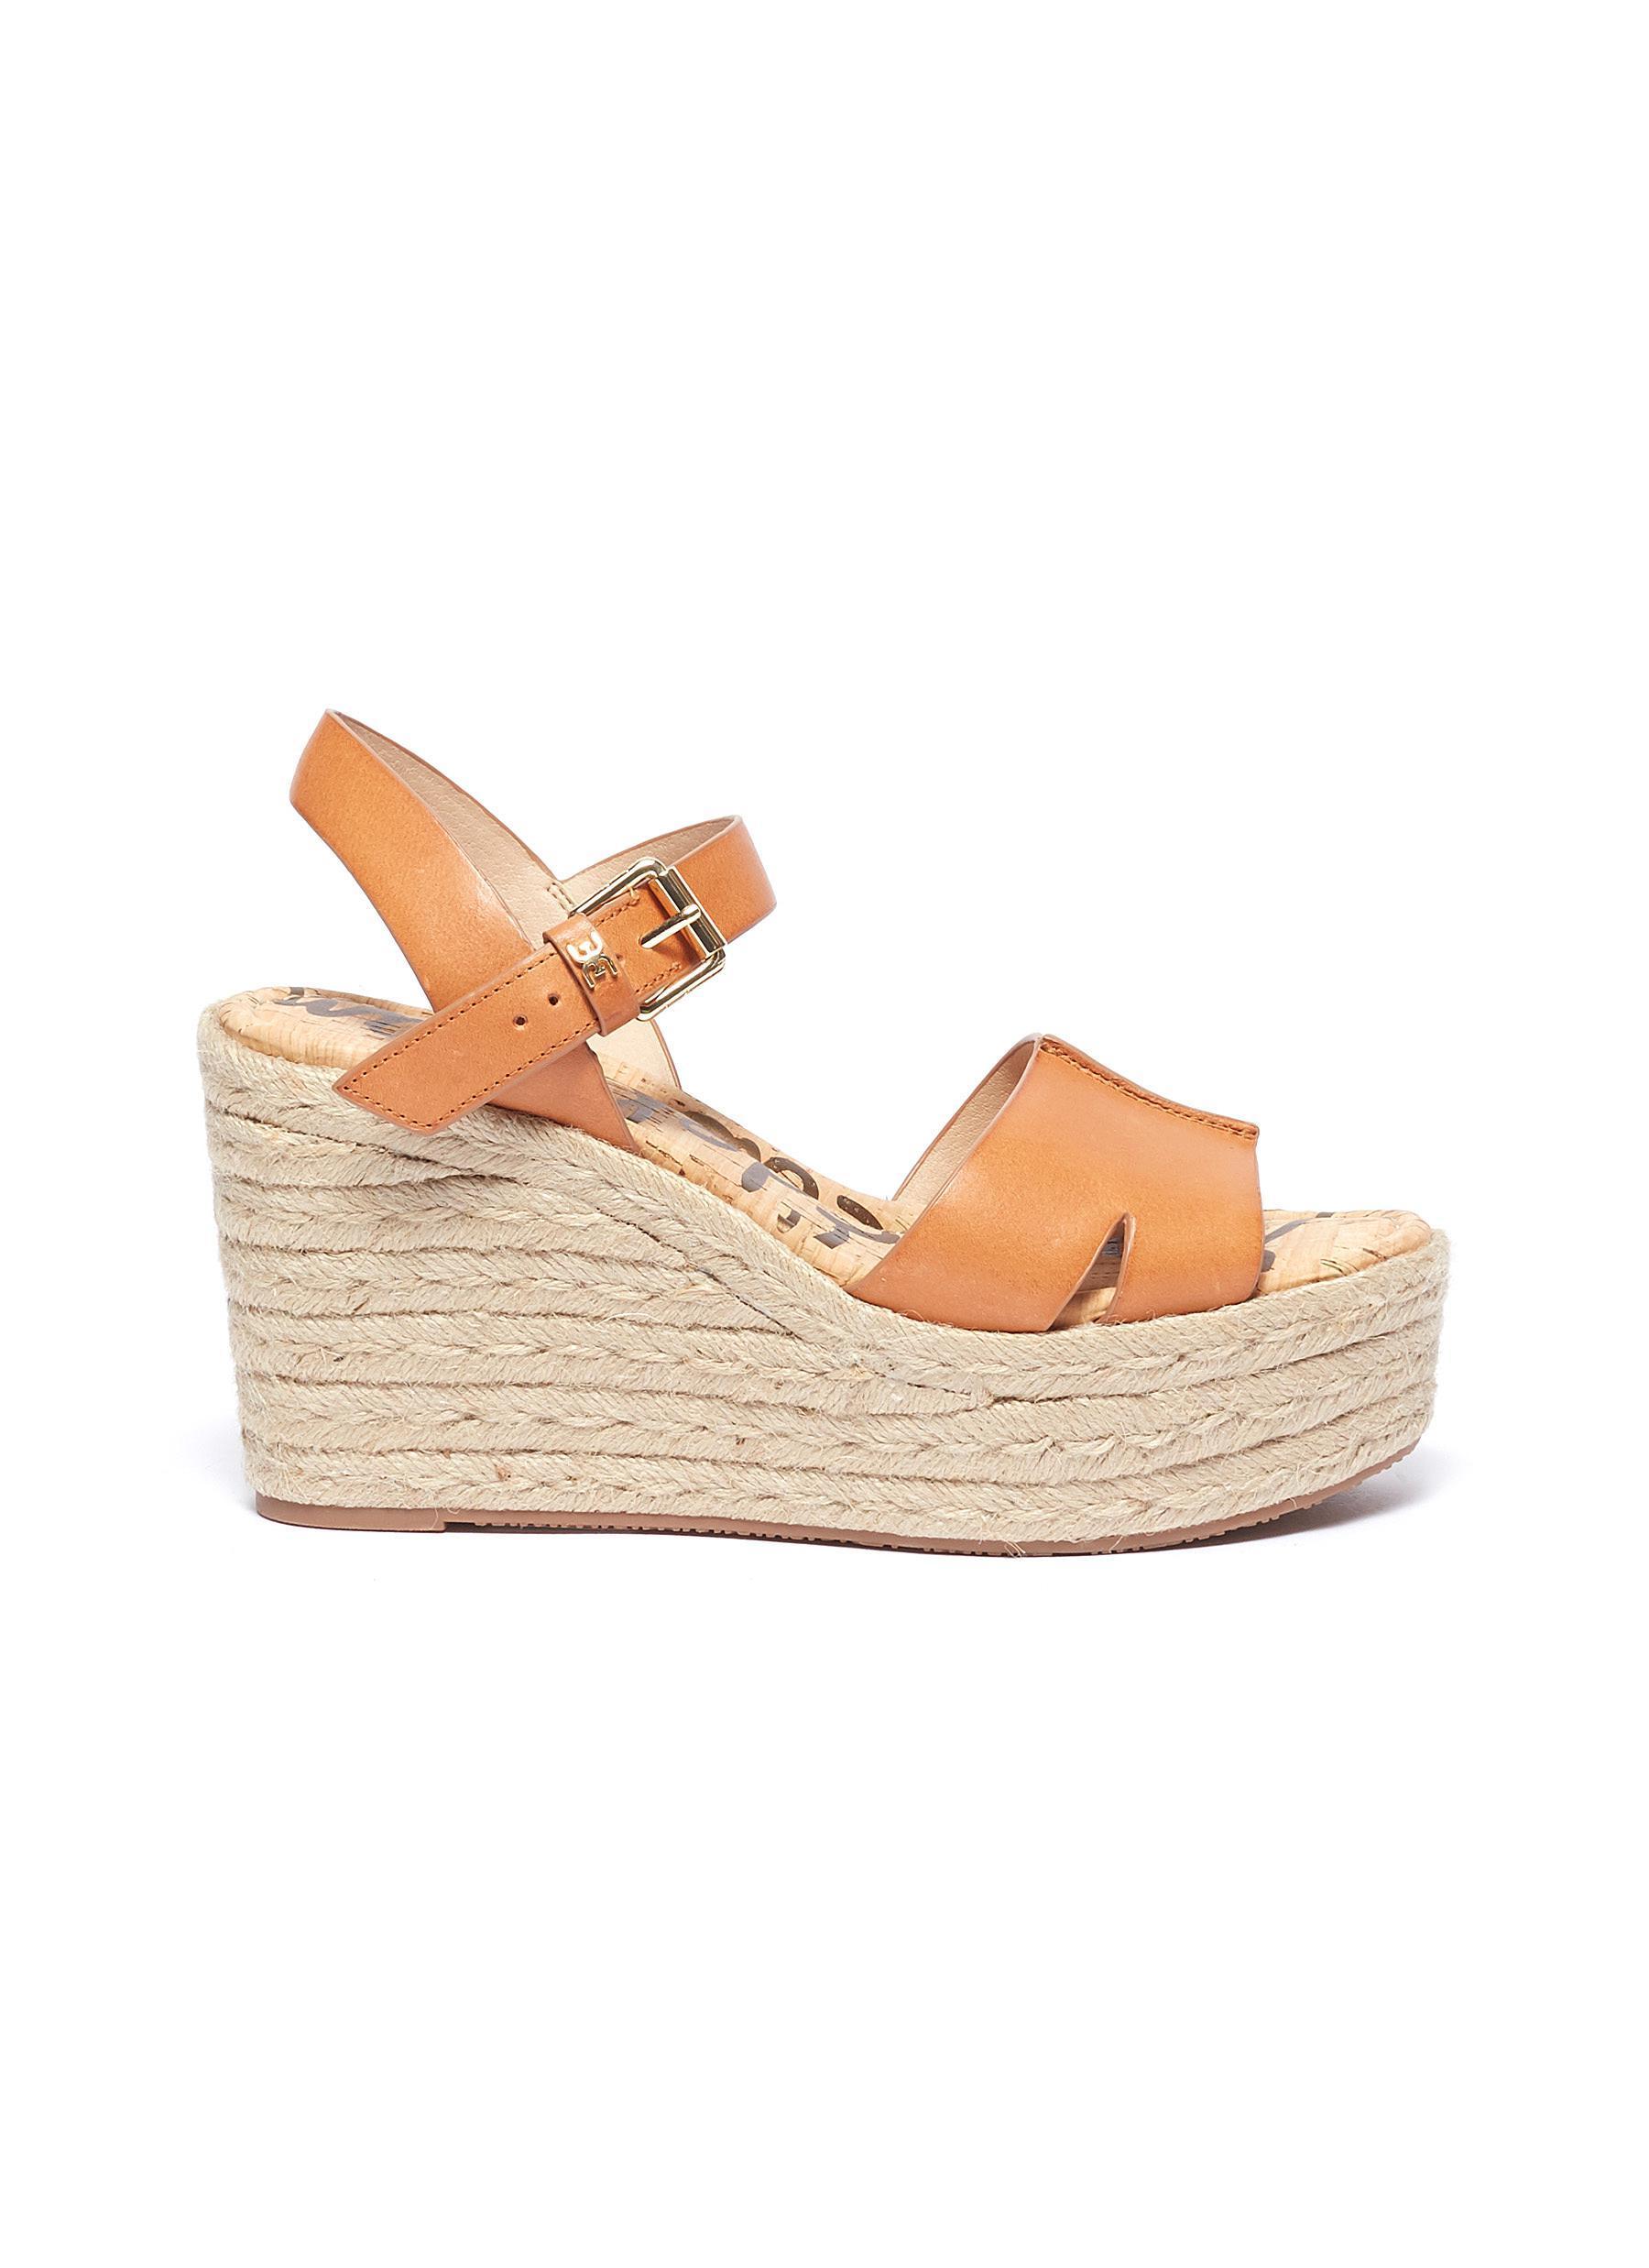 6065edf62fe Women's Brown 'maura' Leather Espadrille Wedge Sandals